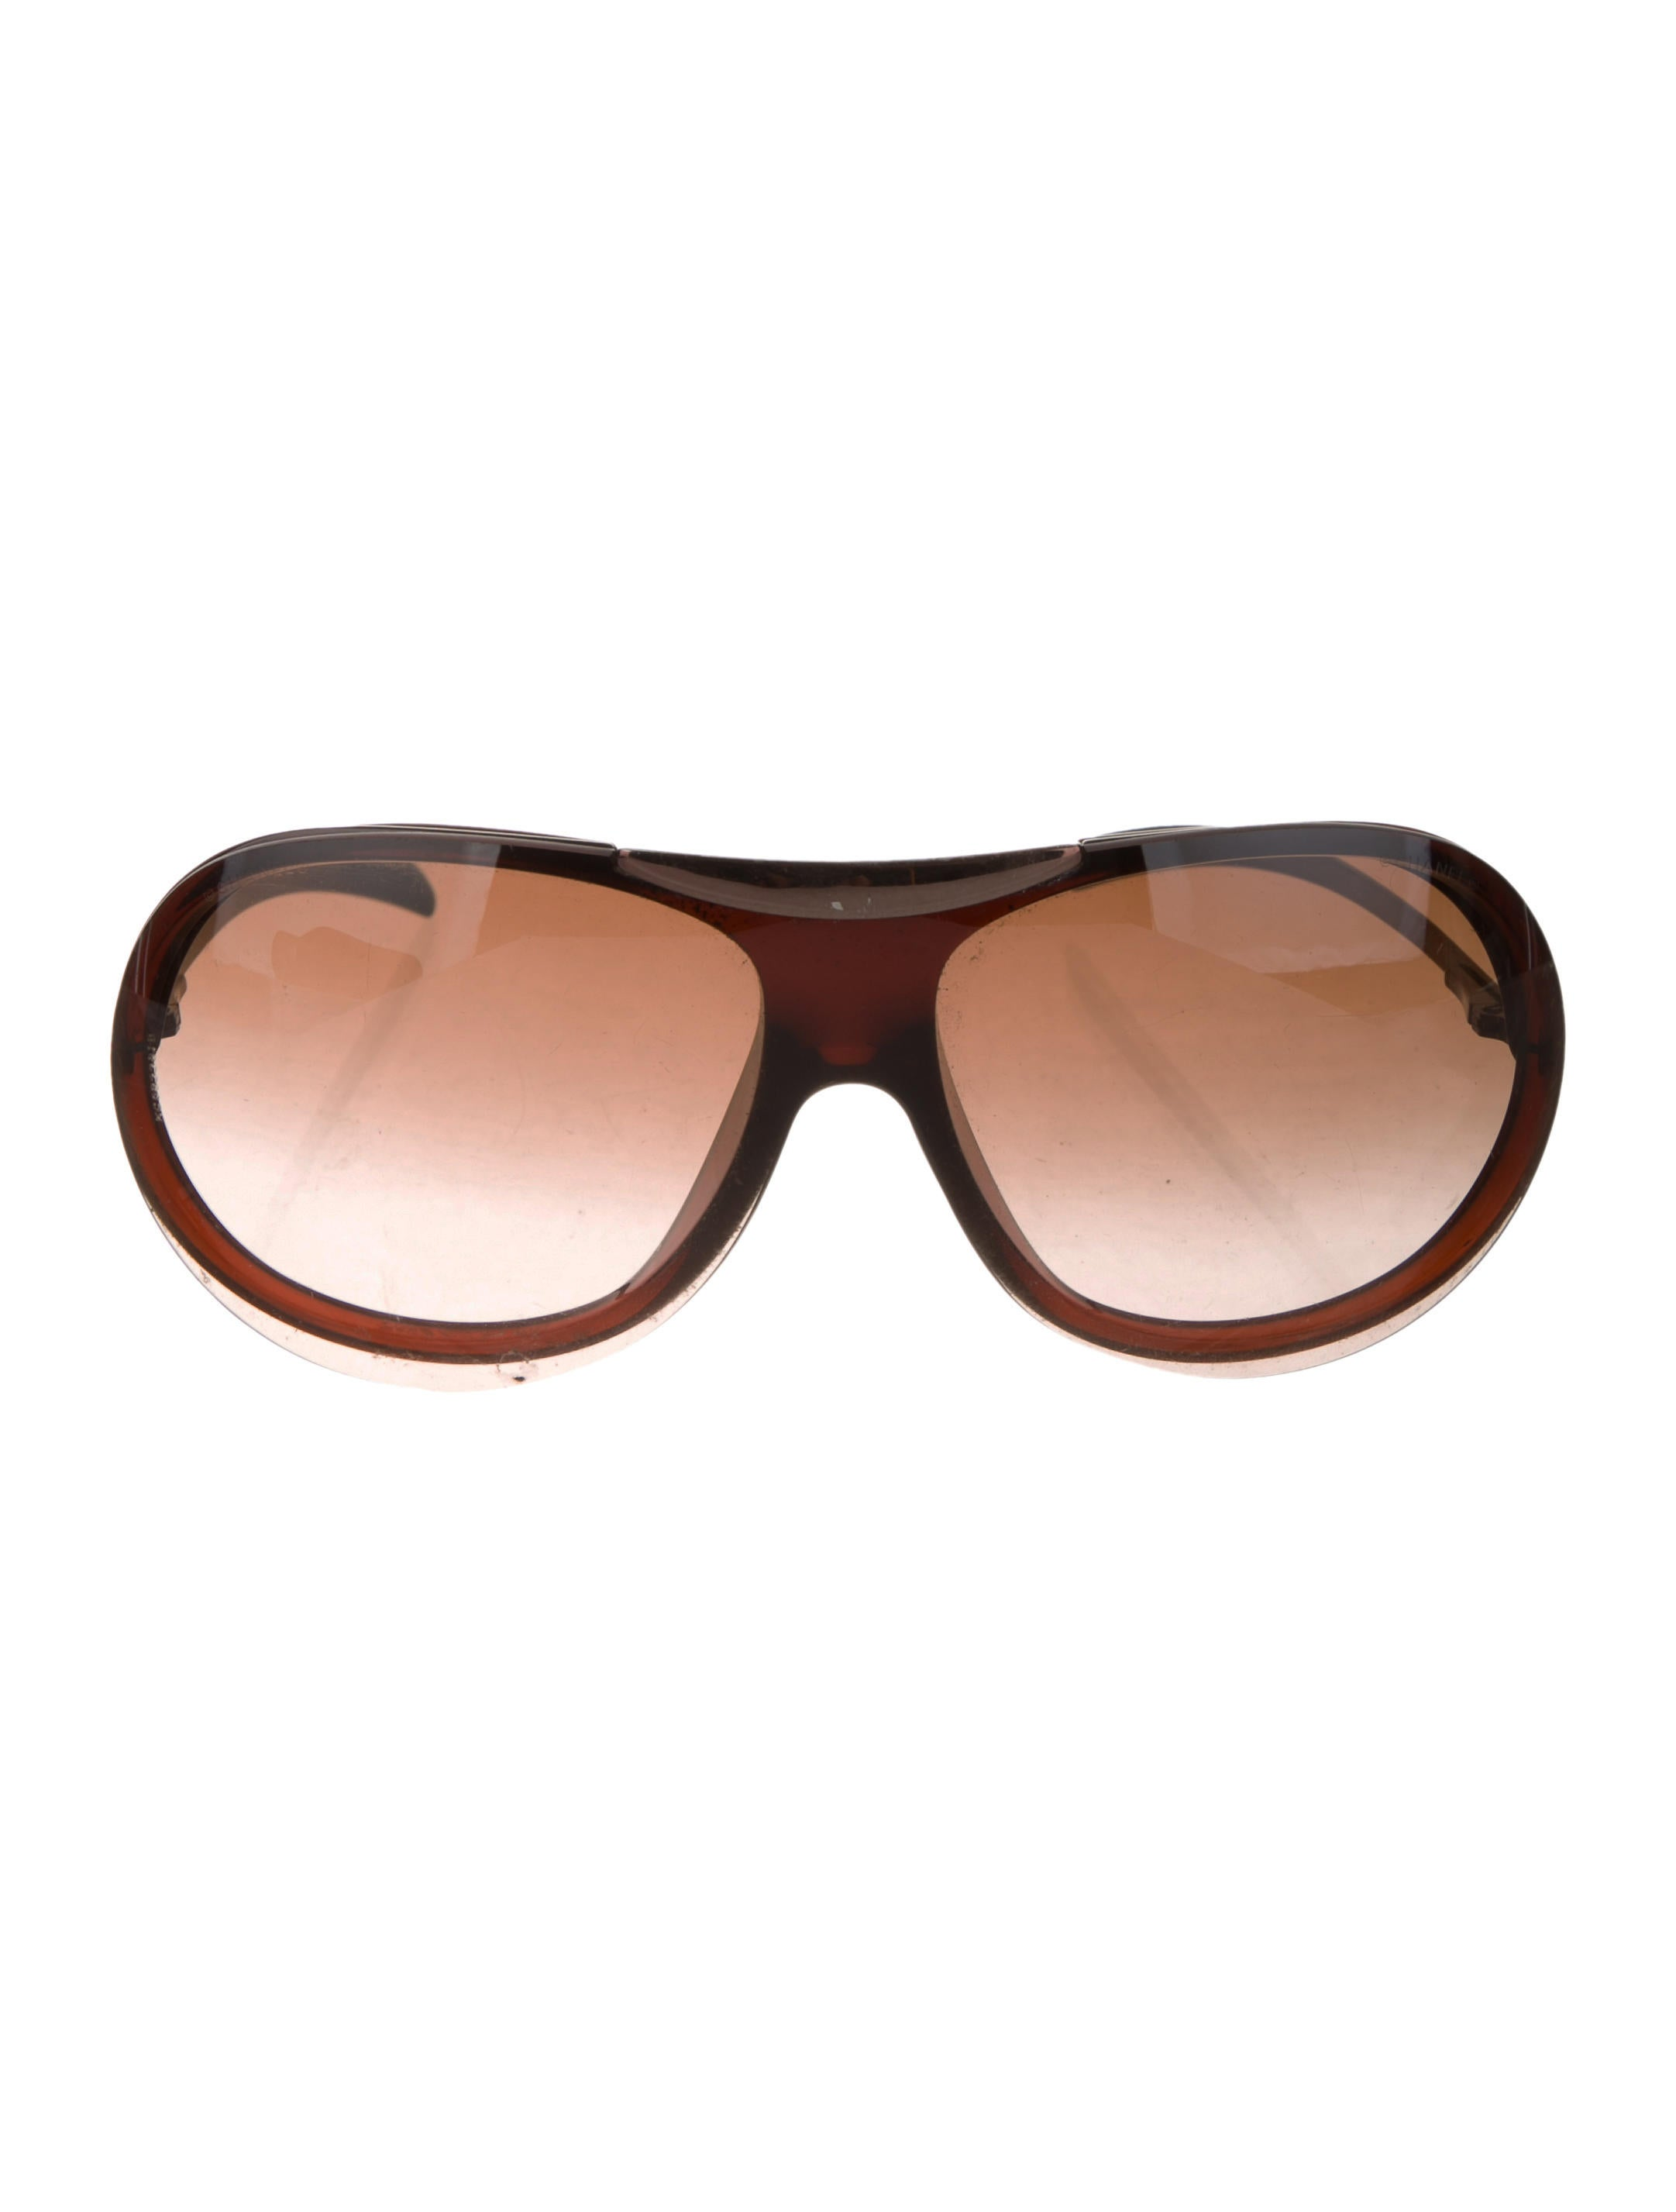 a624b0952ac Chanel Logo Shield Sunglasses - Accessories - CHA287653